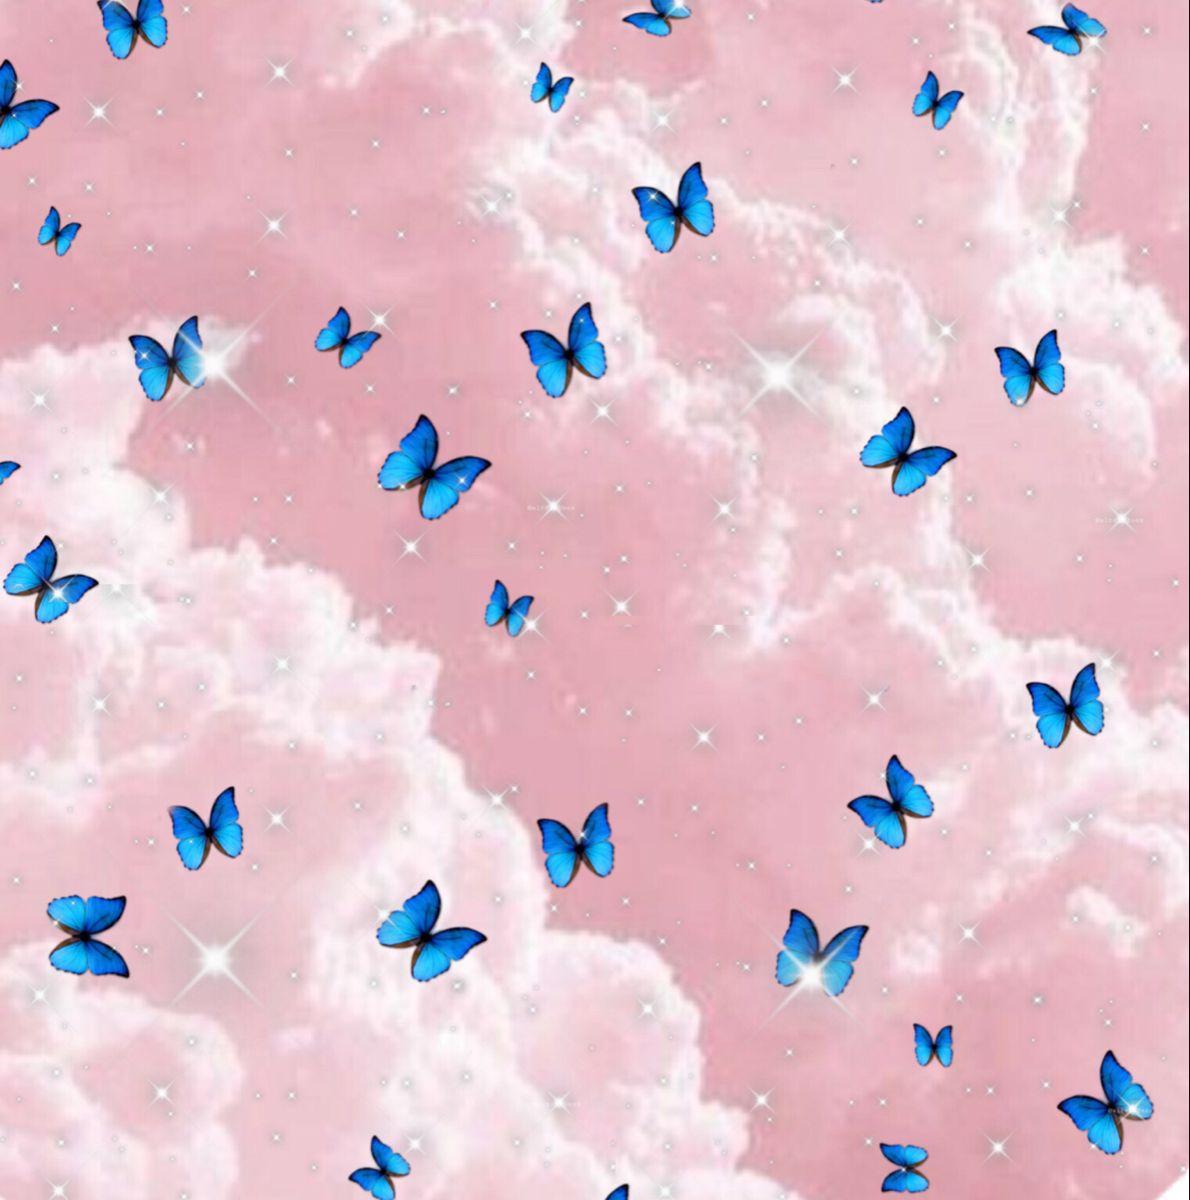 Aesthetic Butterfly Wallpaper Aesthetic Butterfly Wallpaper Butterfly Wallpaper Blue Butterfly Wallpaper